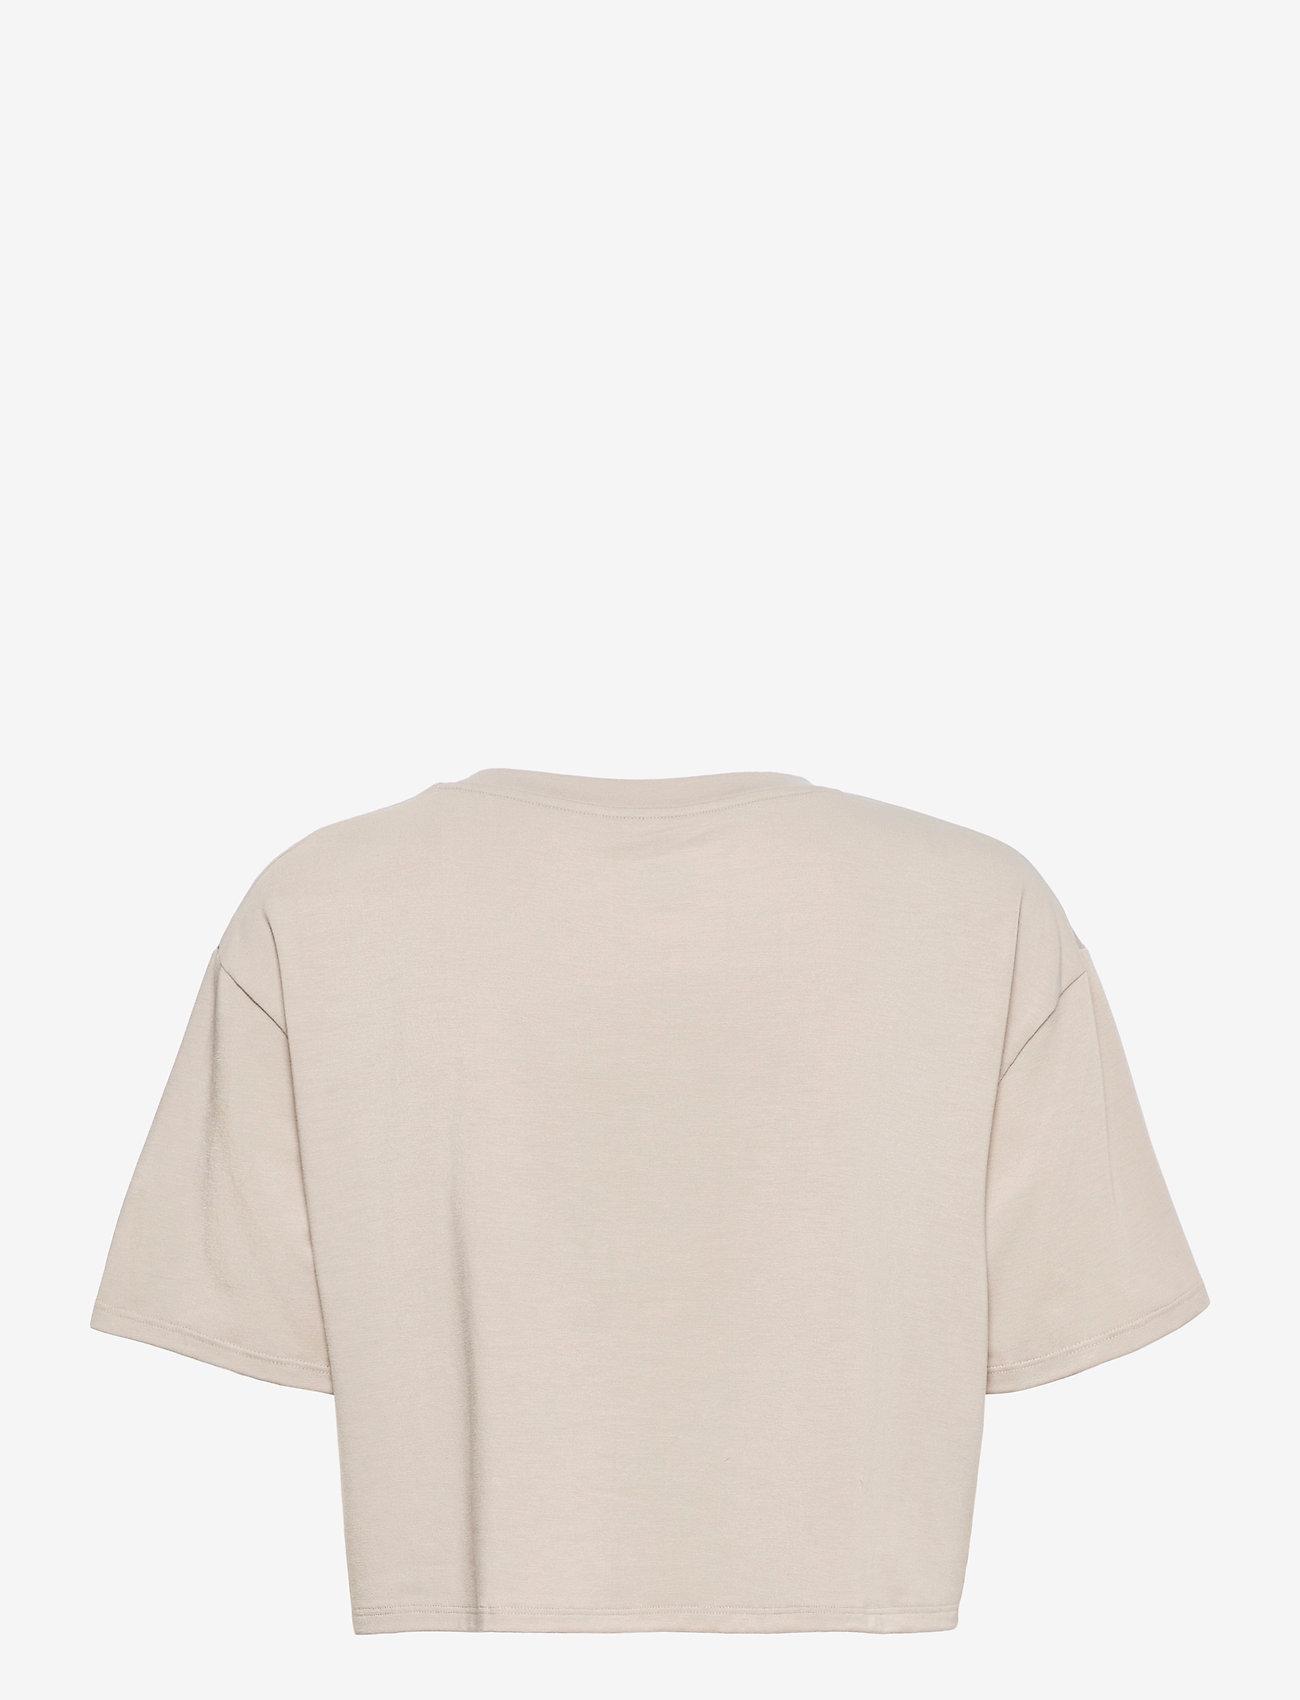 2XU - FORM CROP TEE - navel shirts - oatmeal/white - 1